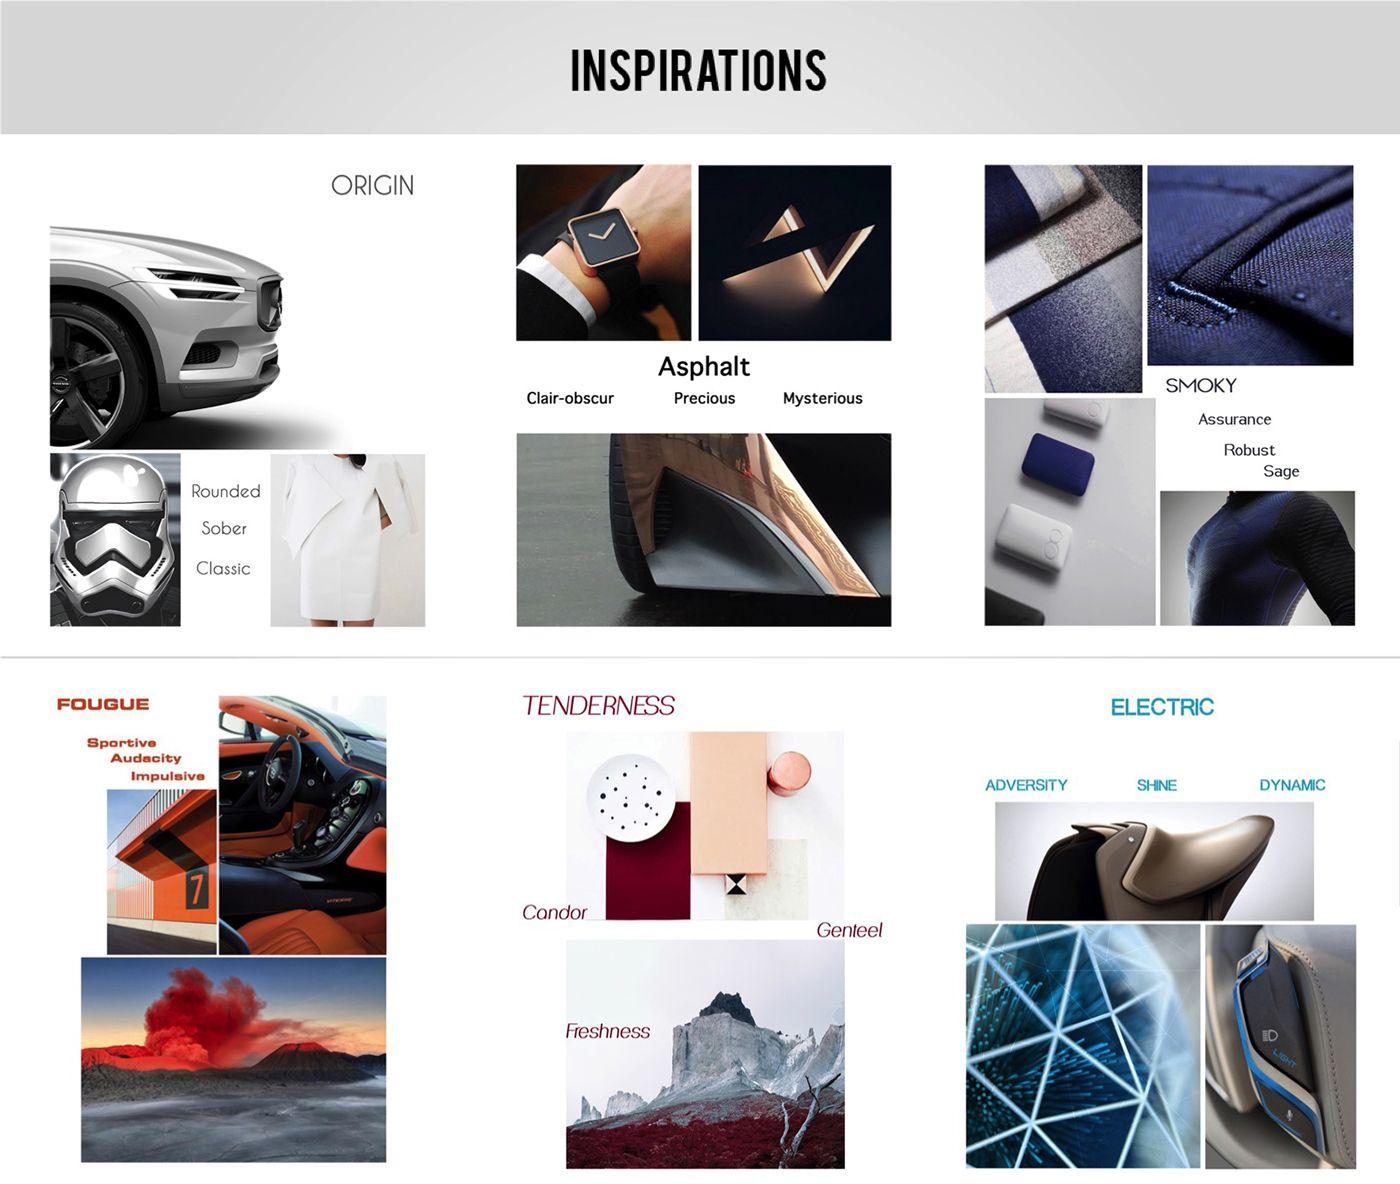 Institut Supérieur De Design Valenciennes semester project : create a business class inspired